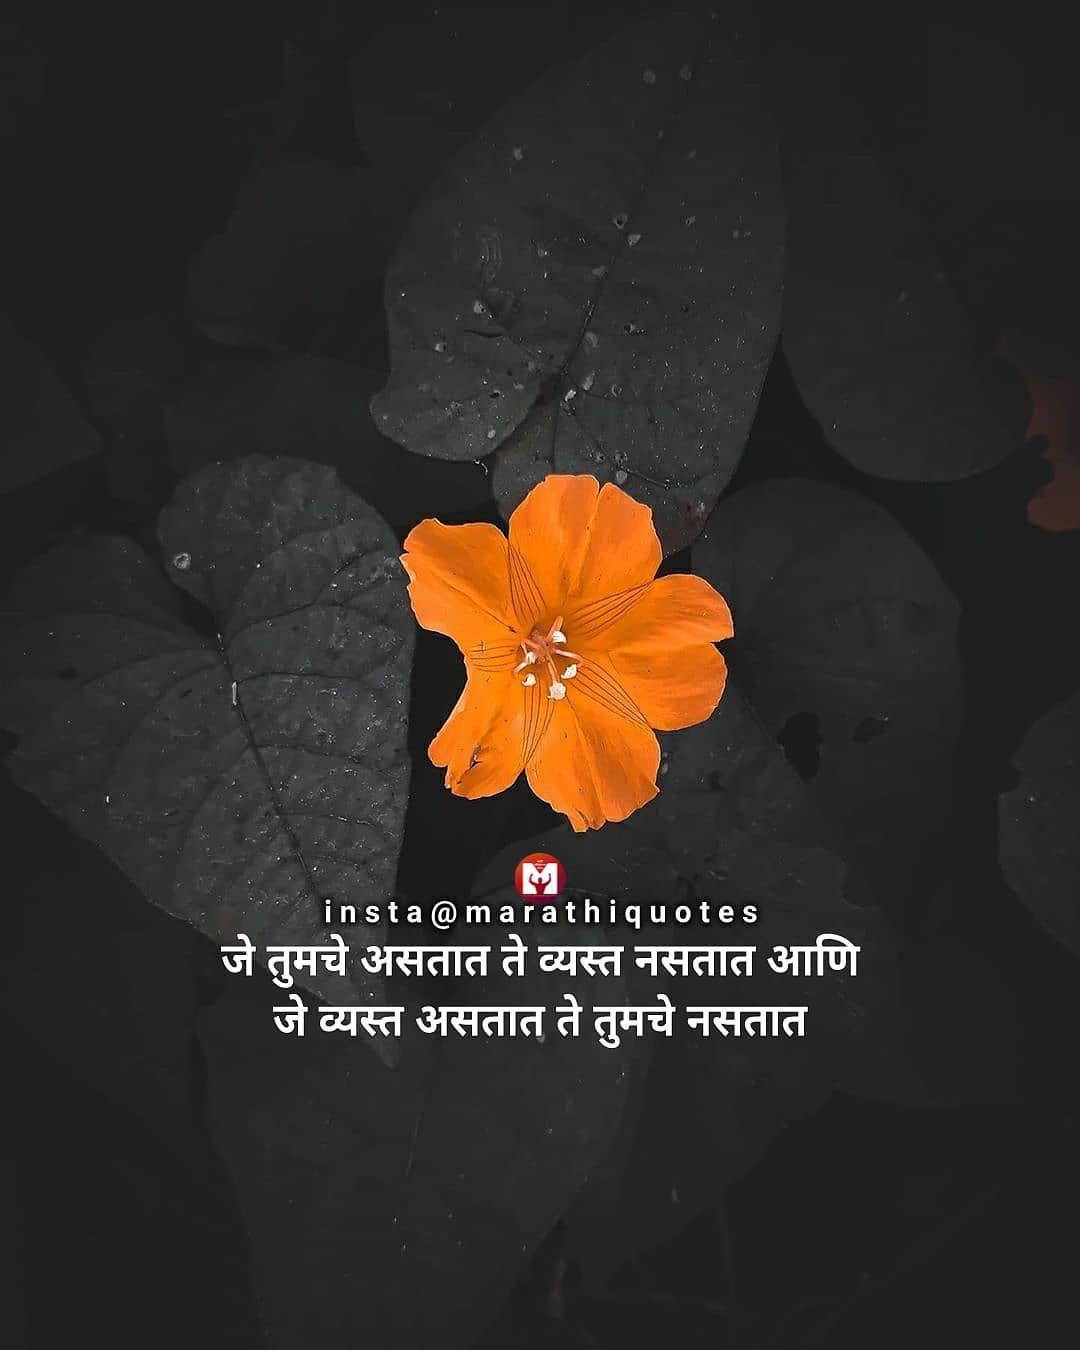 Pin on Marathi Quotes